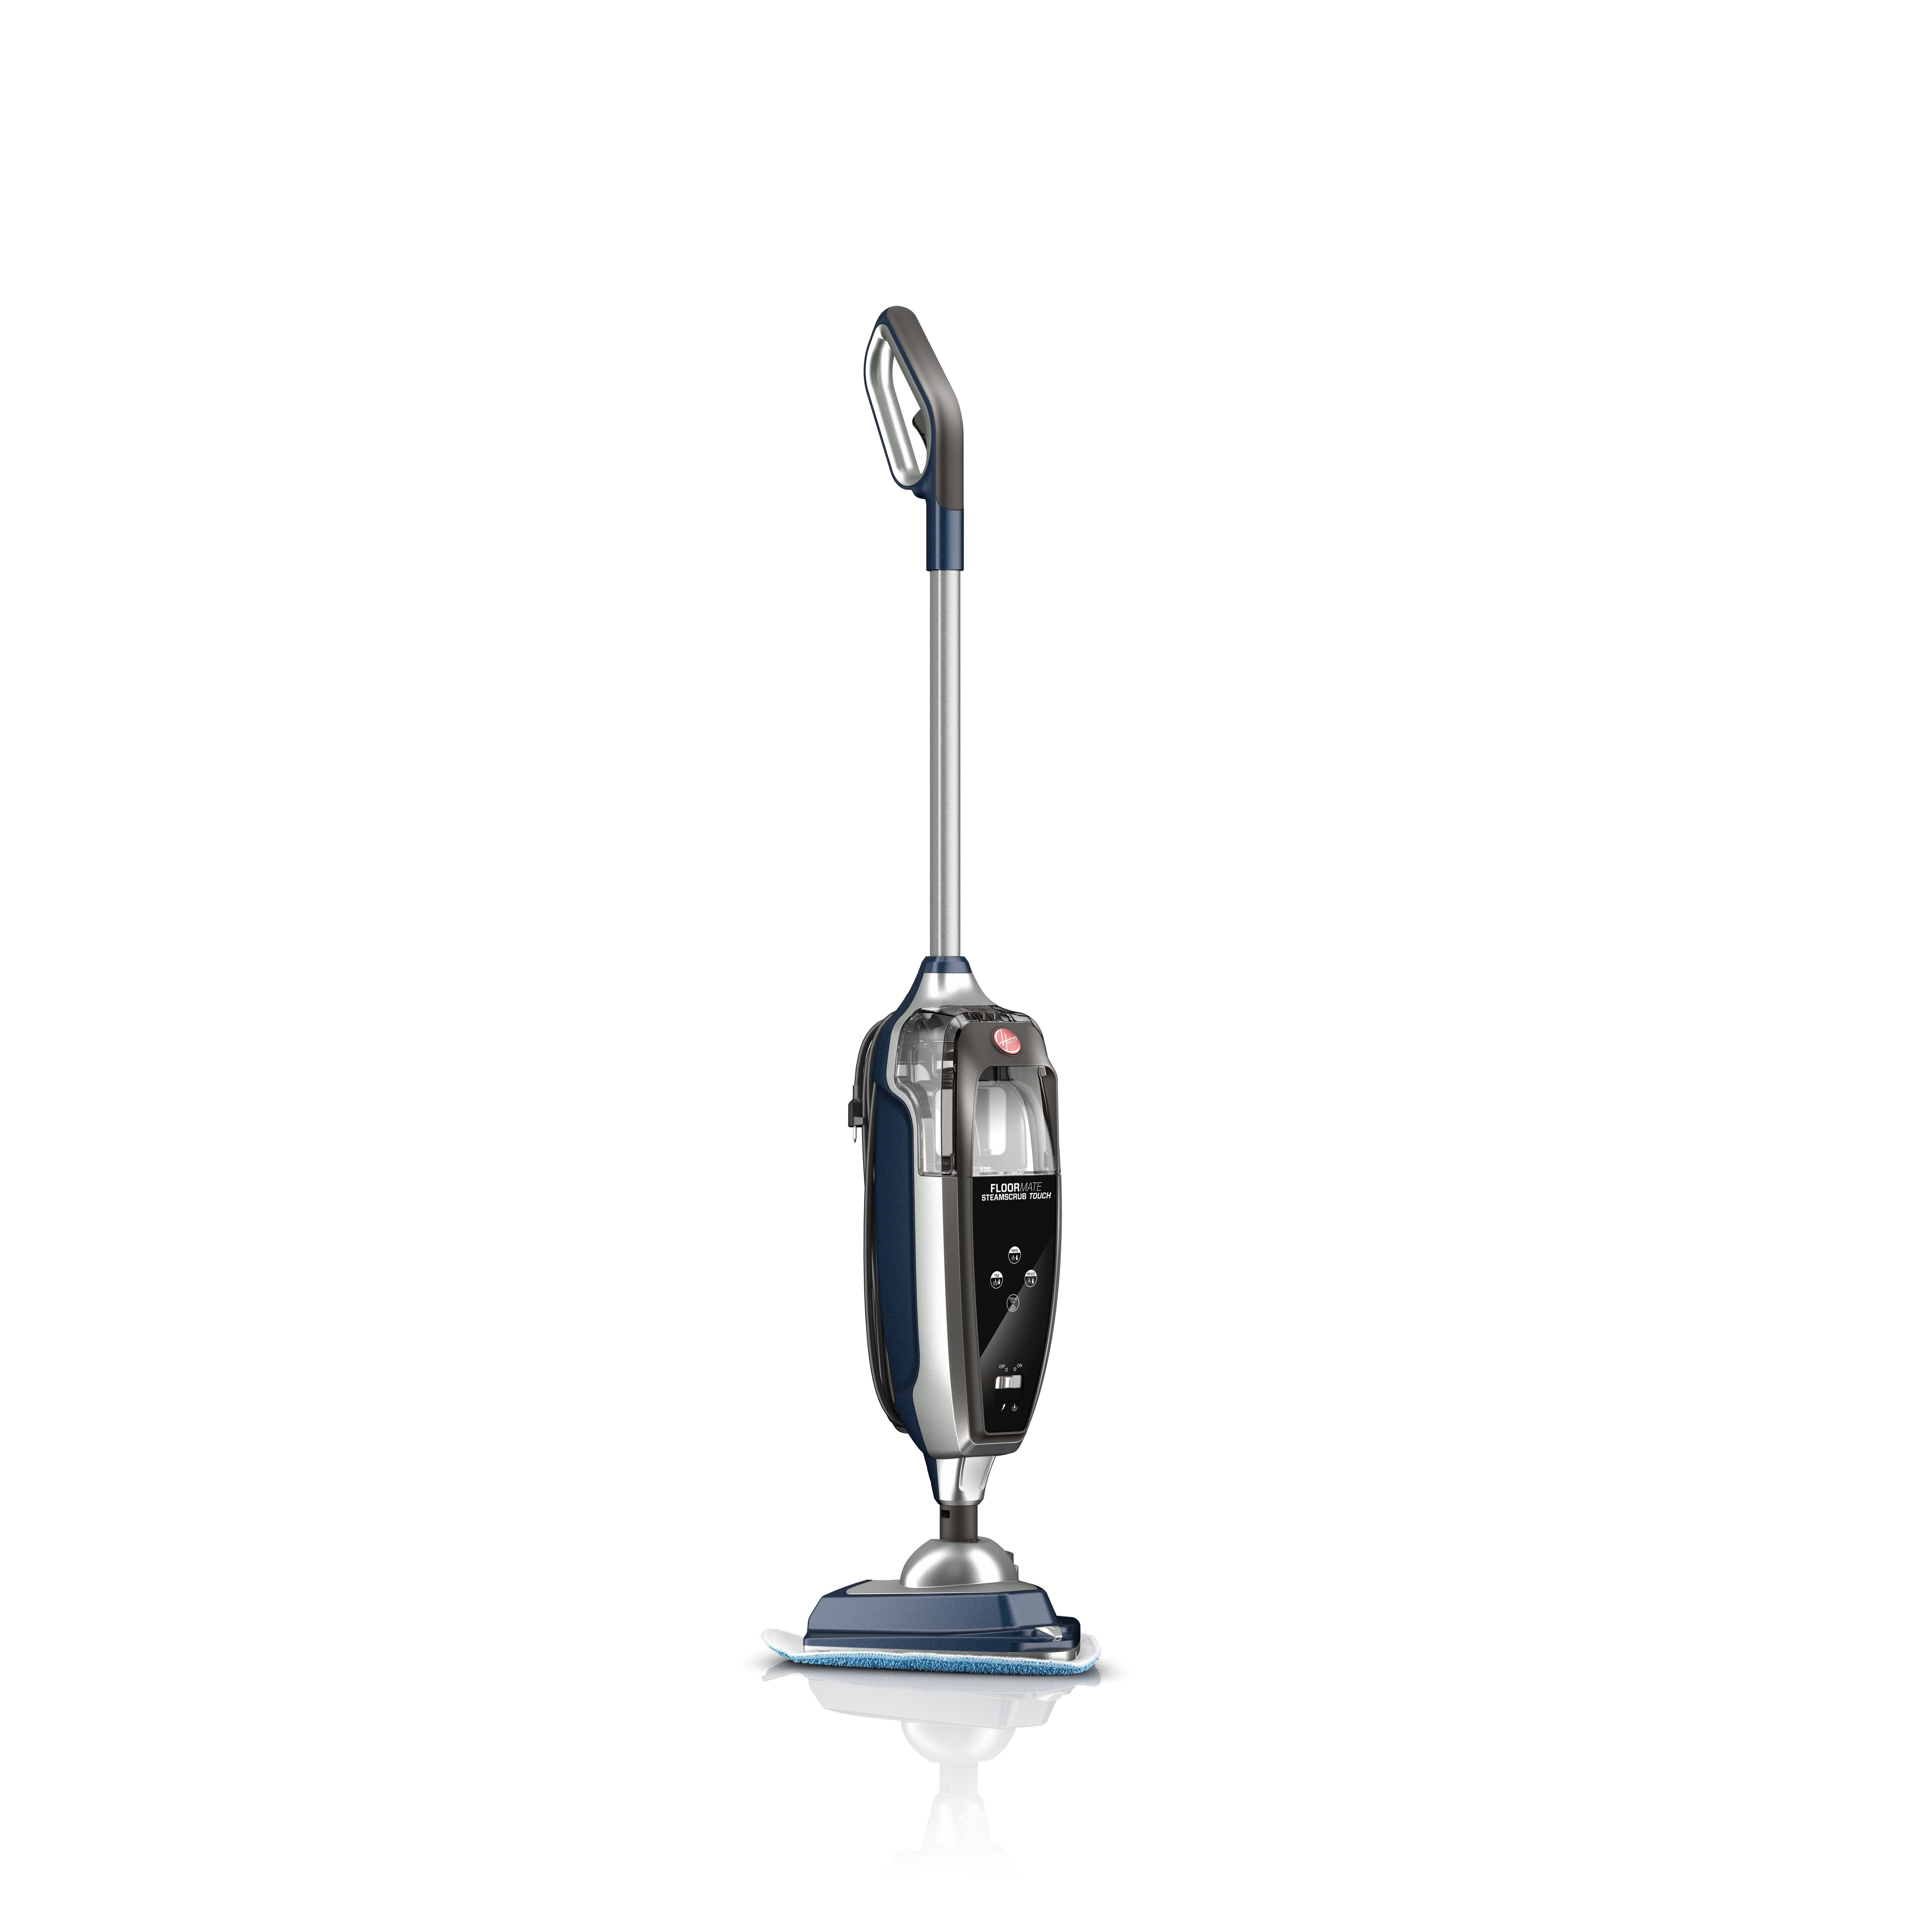 FloorMate SteamScrub Touch Steam Cleaner Mop2